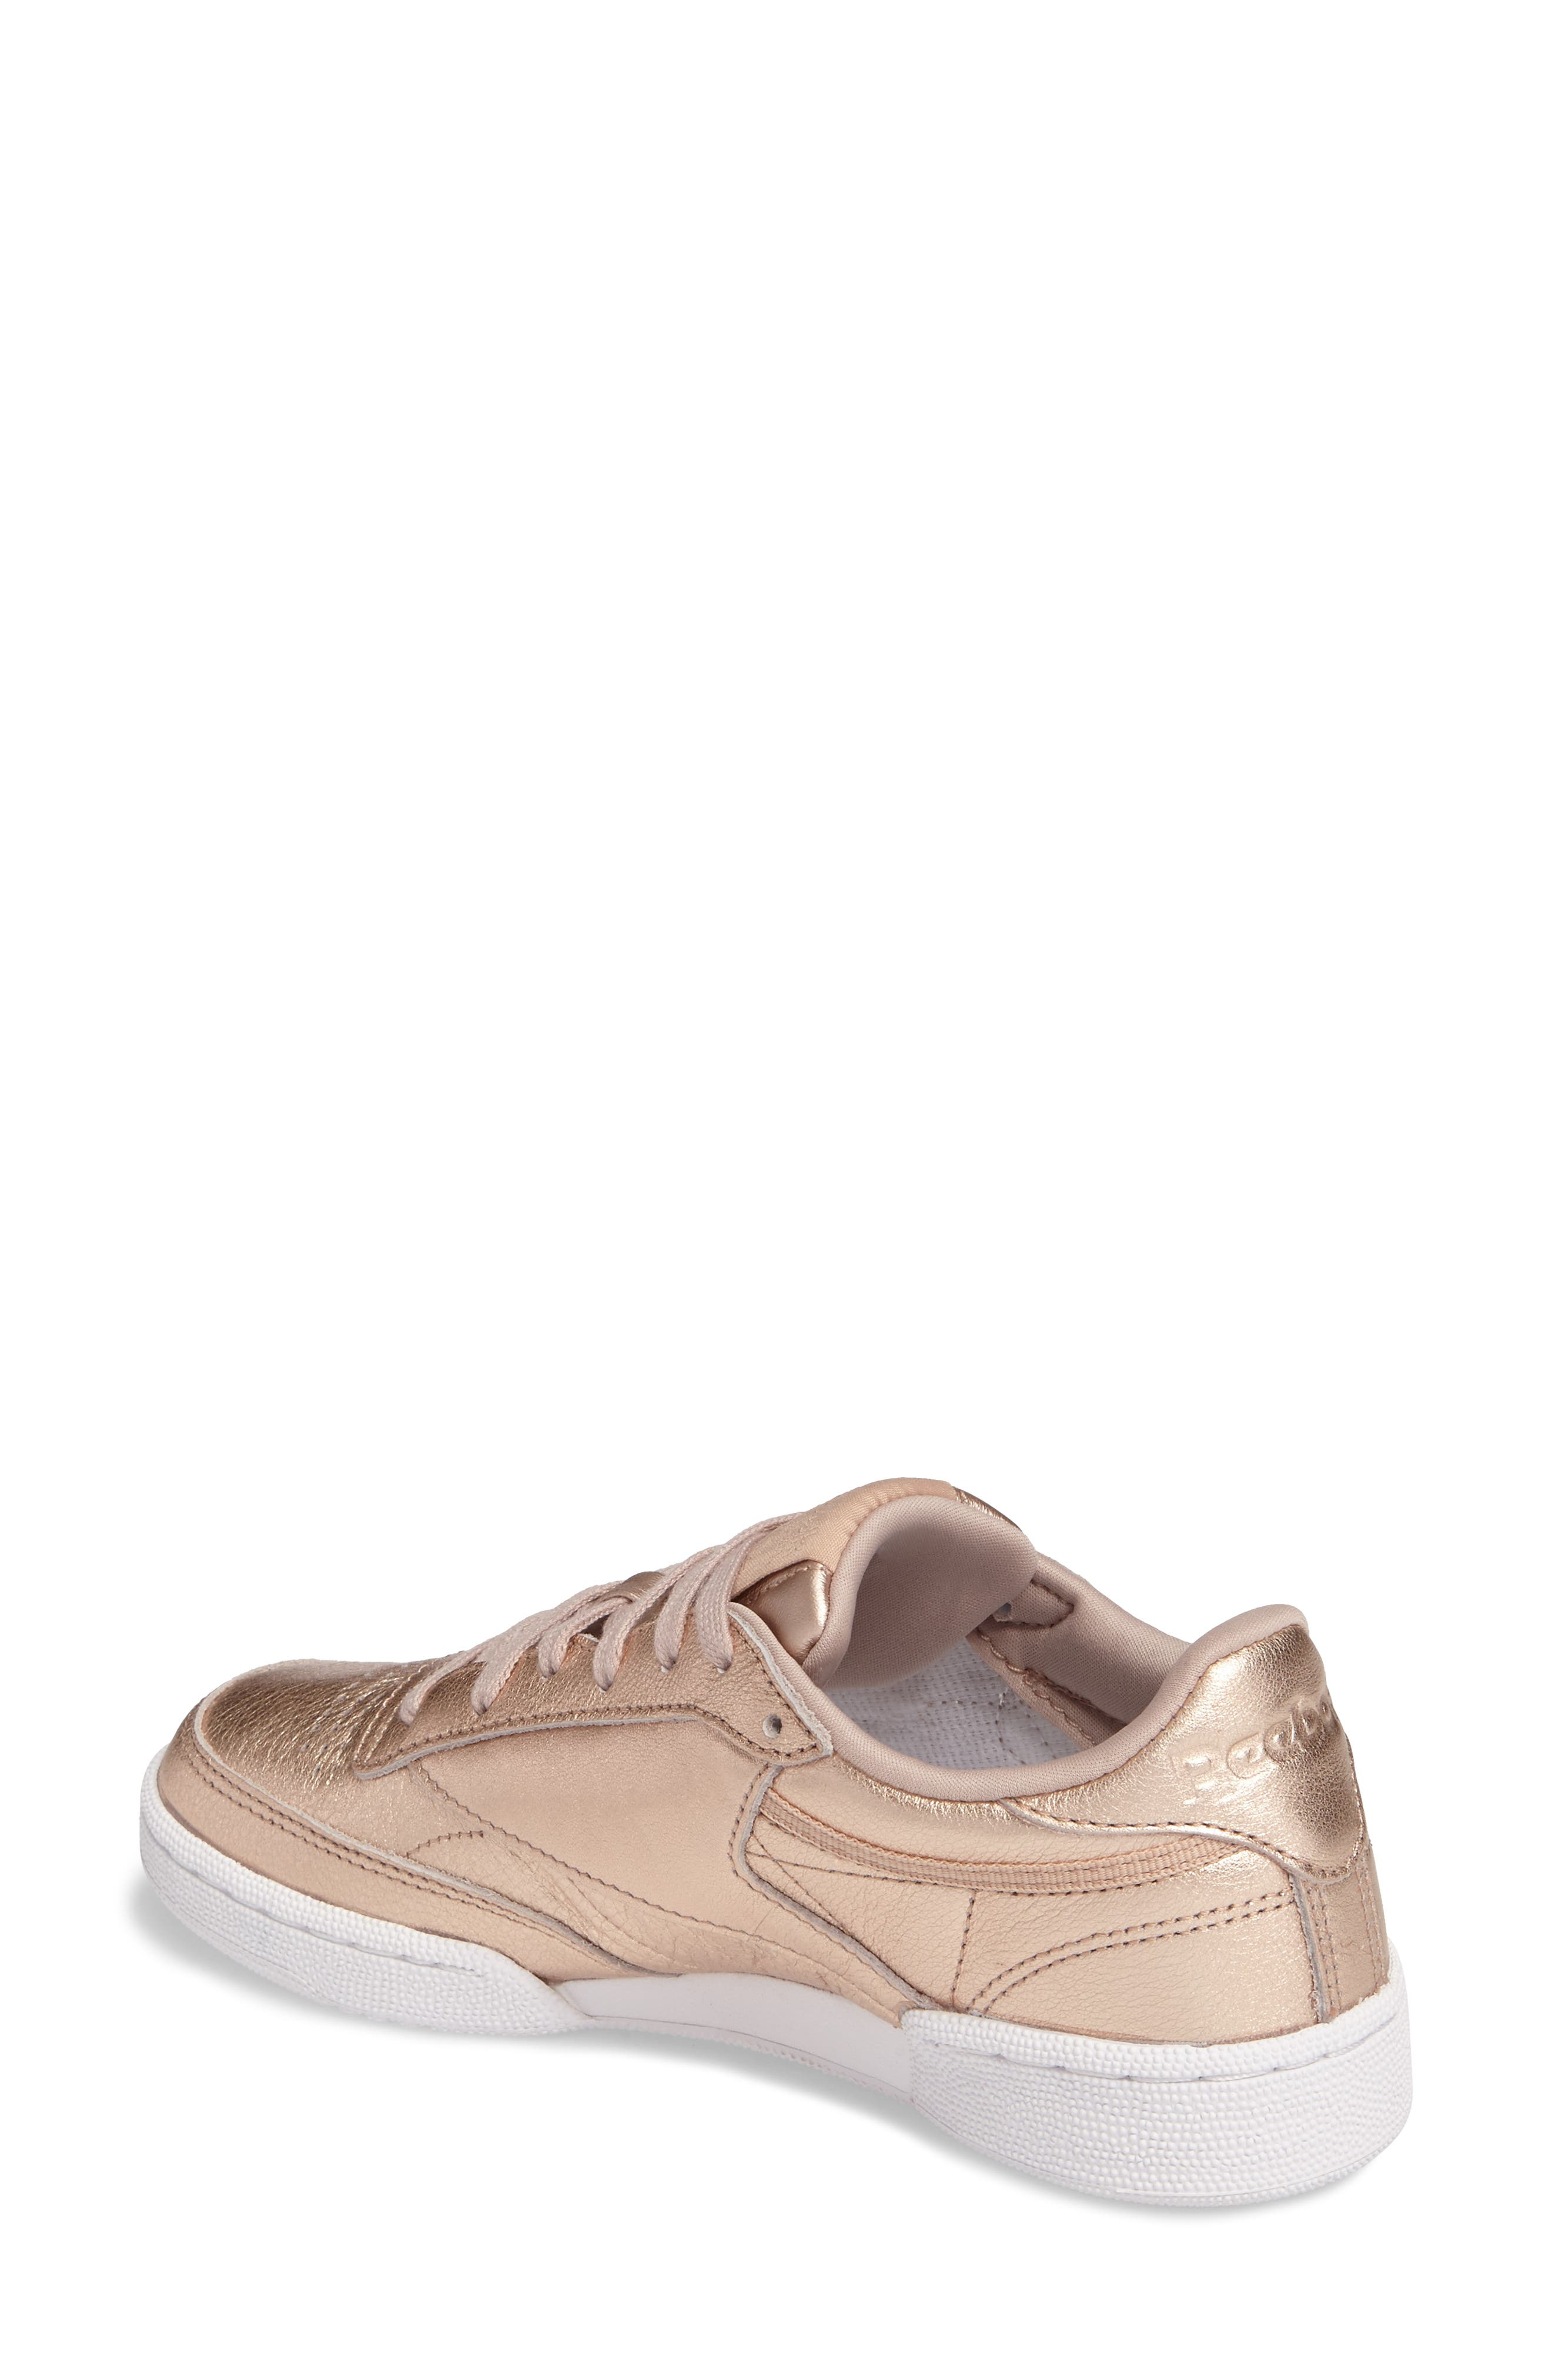 Club C 85 Sneaker,                             Alternate thumbnail 2, color,                             Peach/ White Pearl